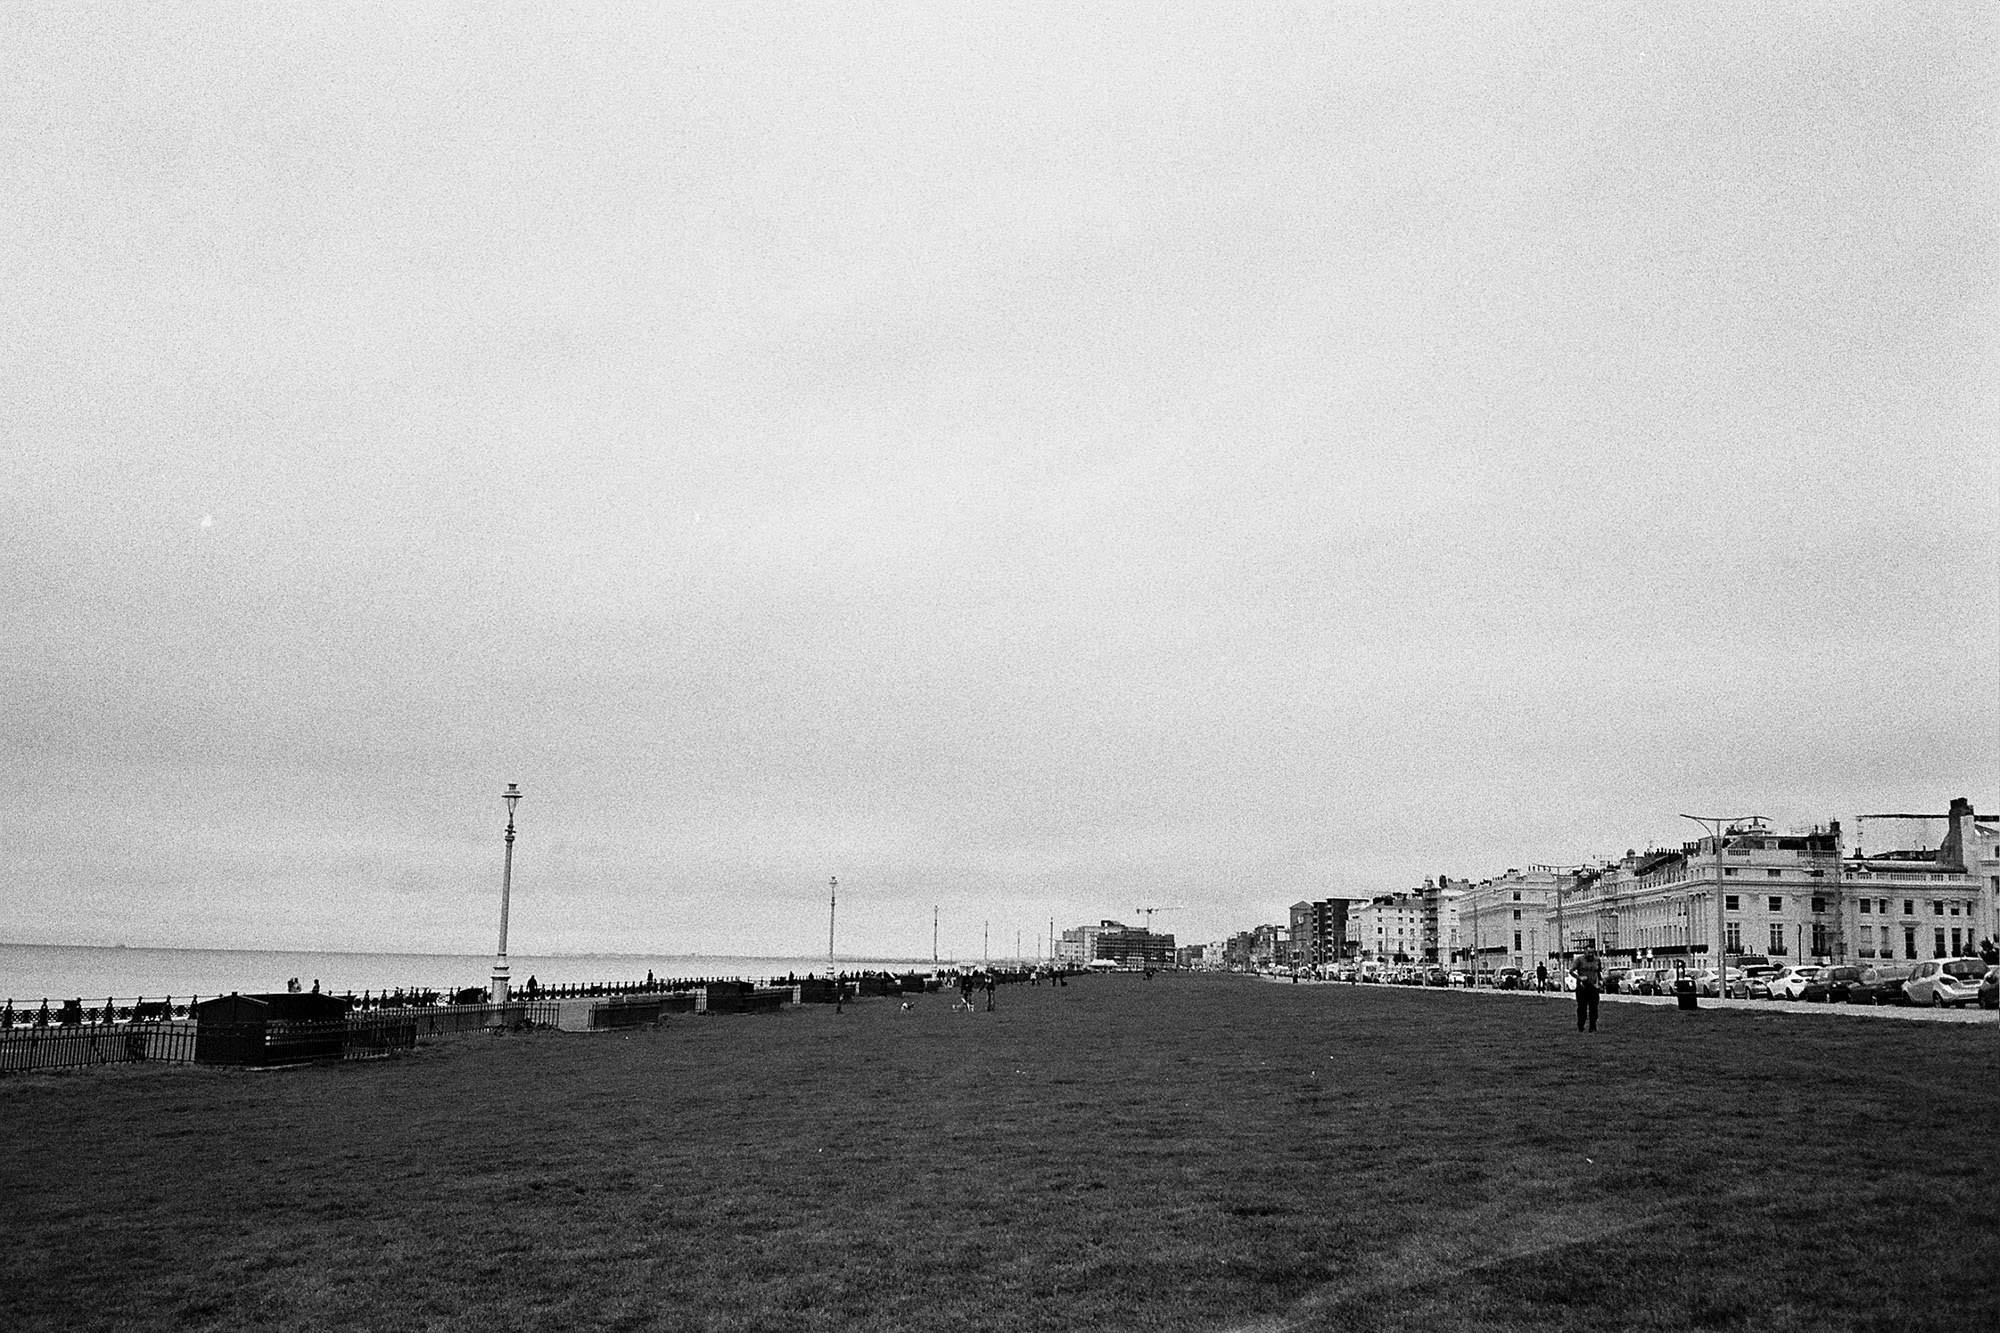 hove-lawns-black-and-white-olympus-mju-ii